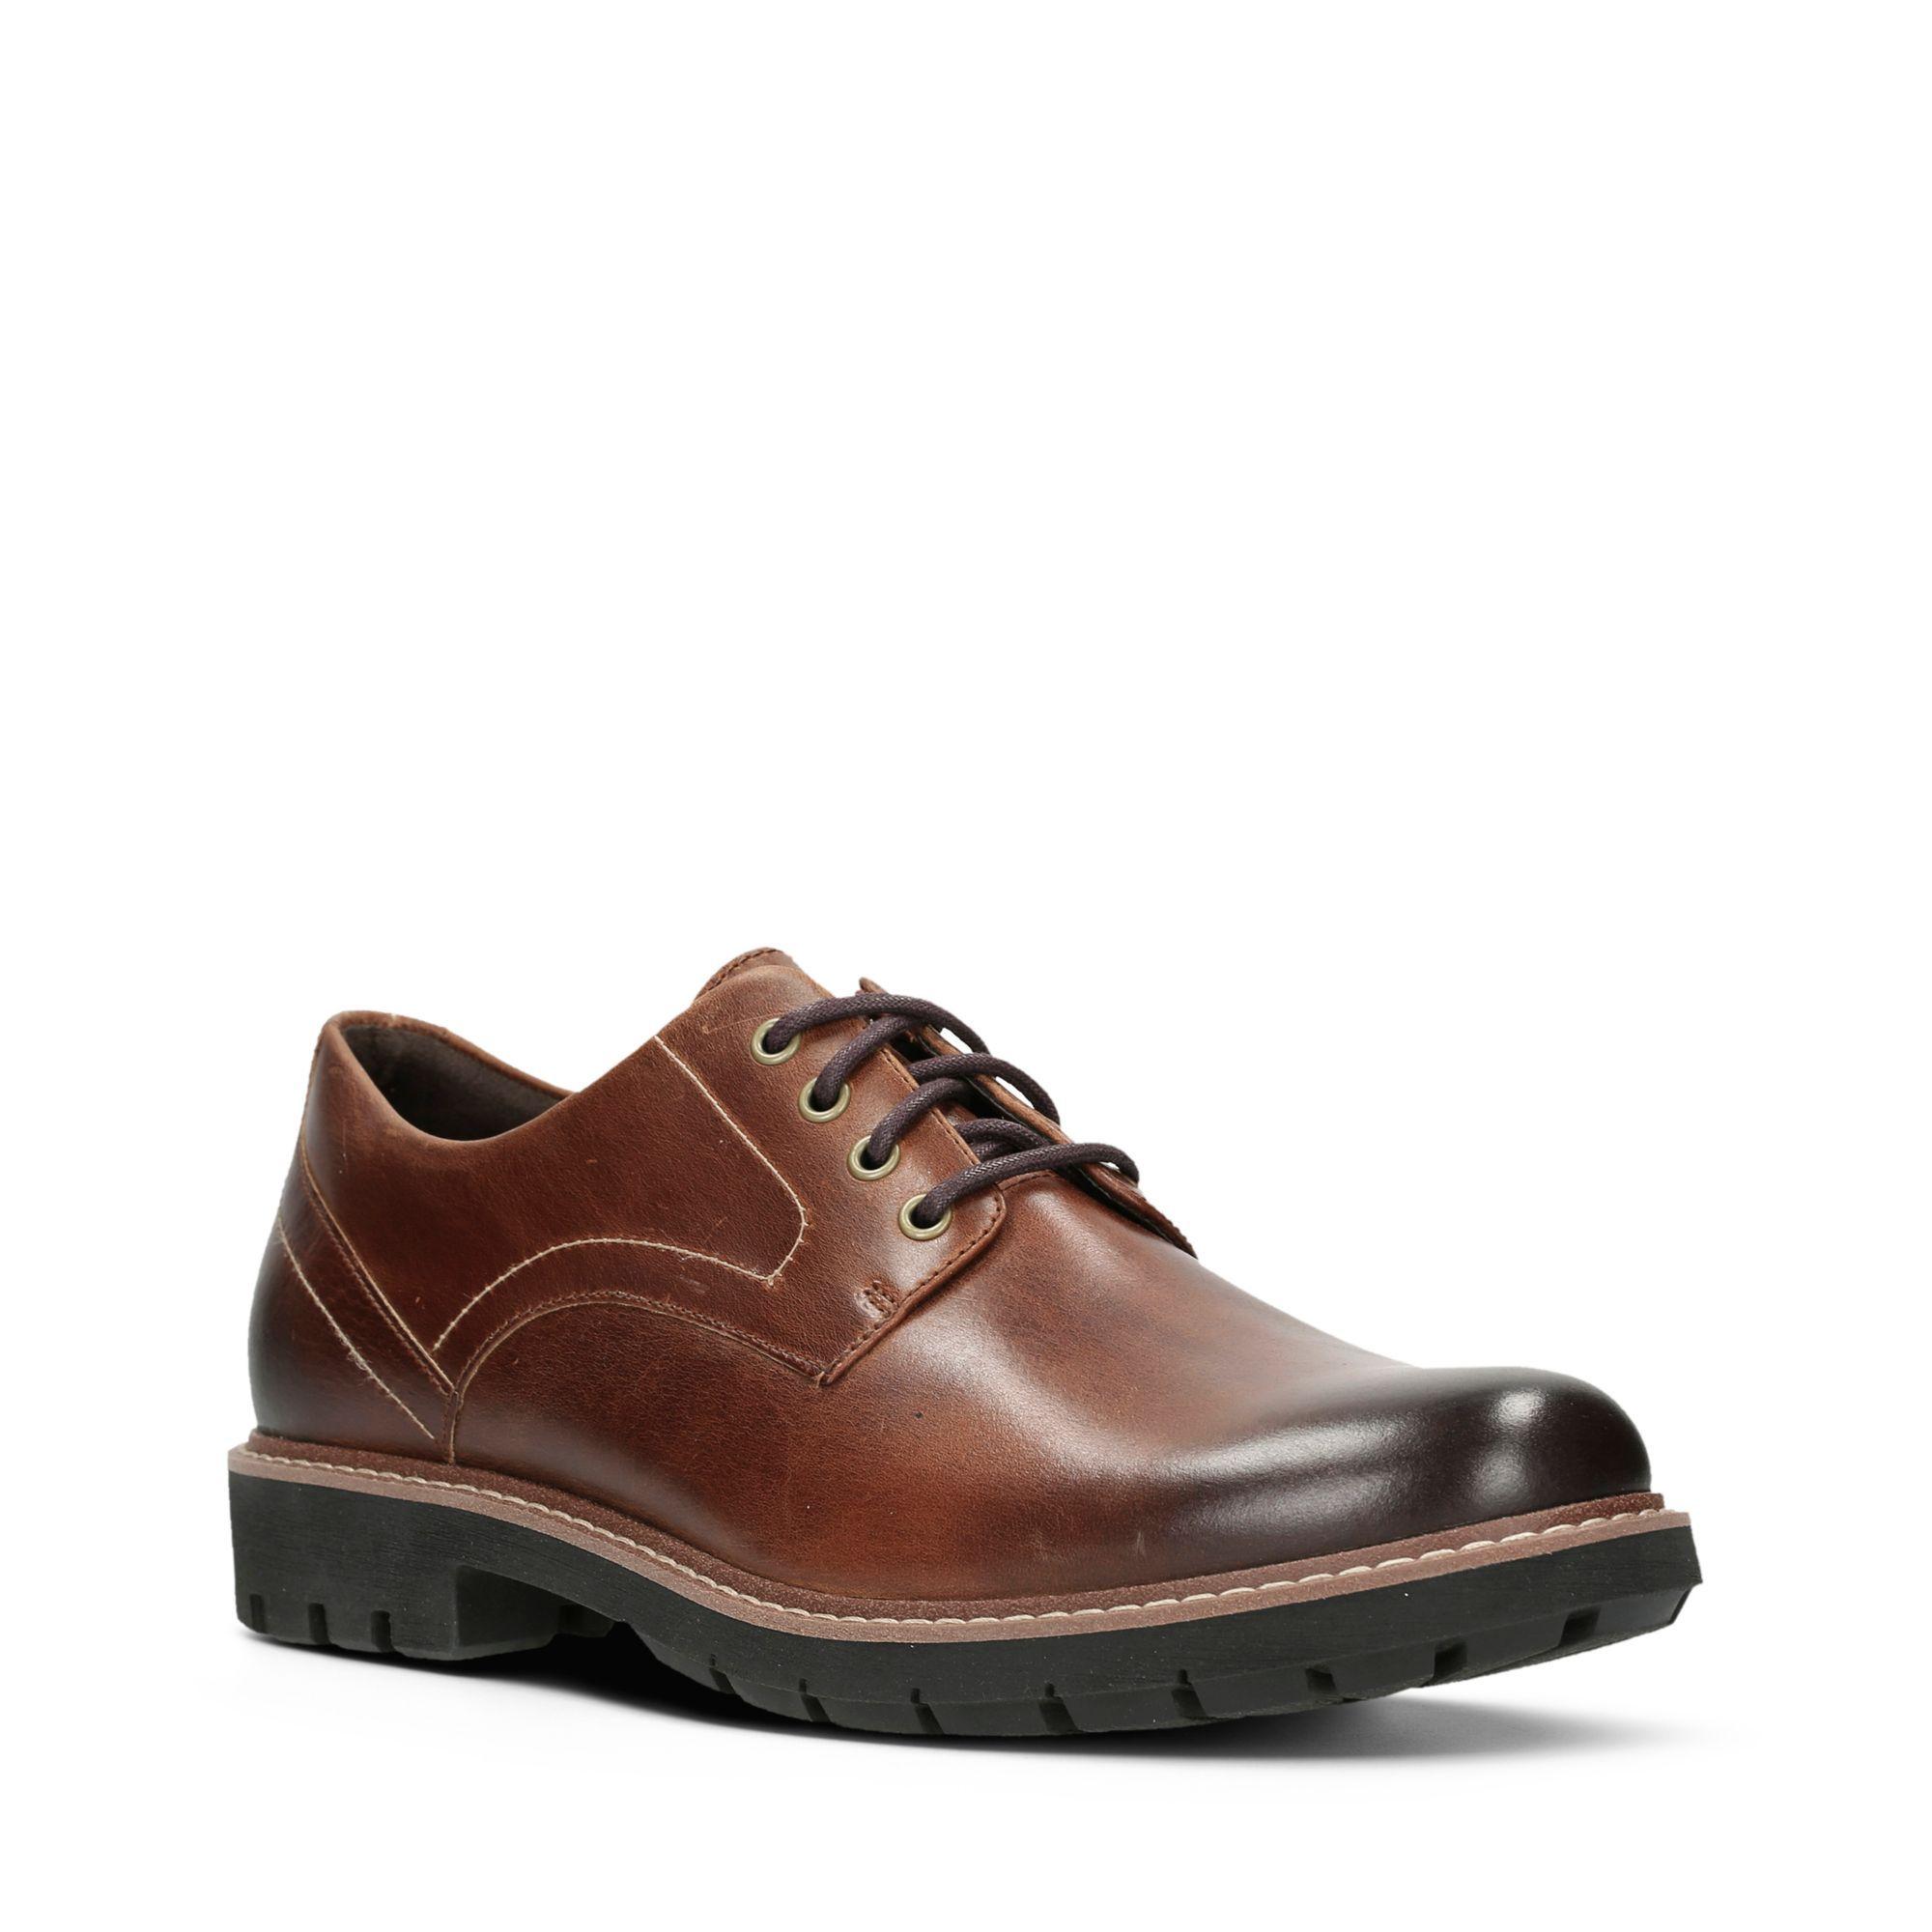 Clarks Men's Batcombe Hall Shoes Various Colours 5050409790120 - 6 UK Dark Tan